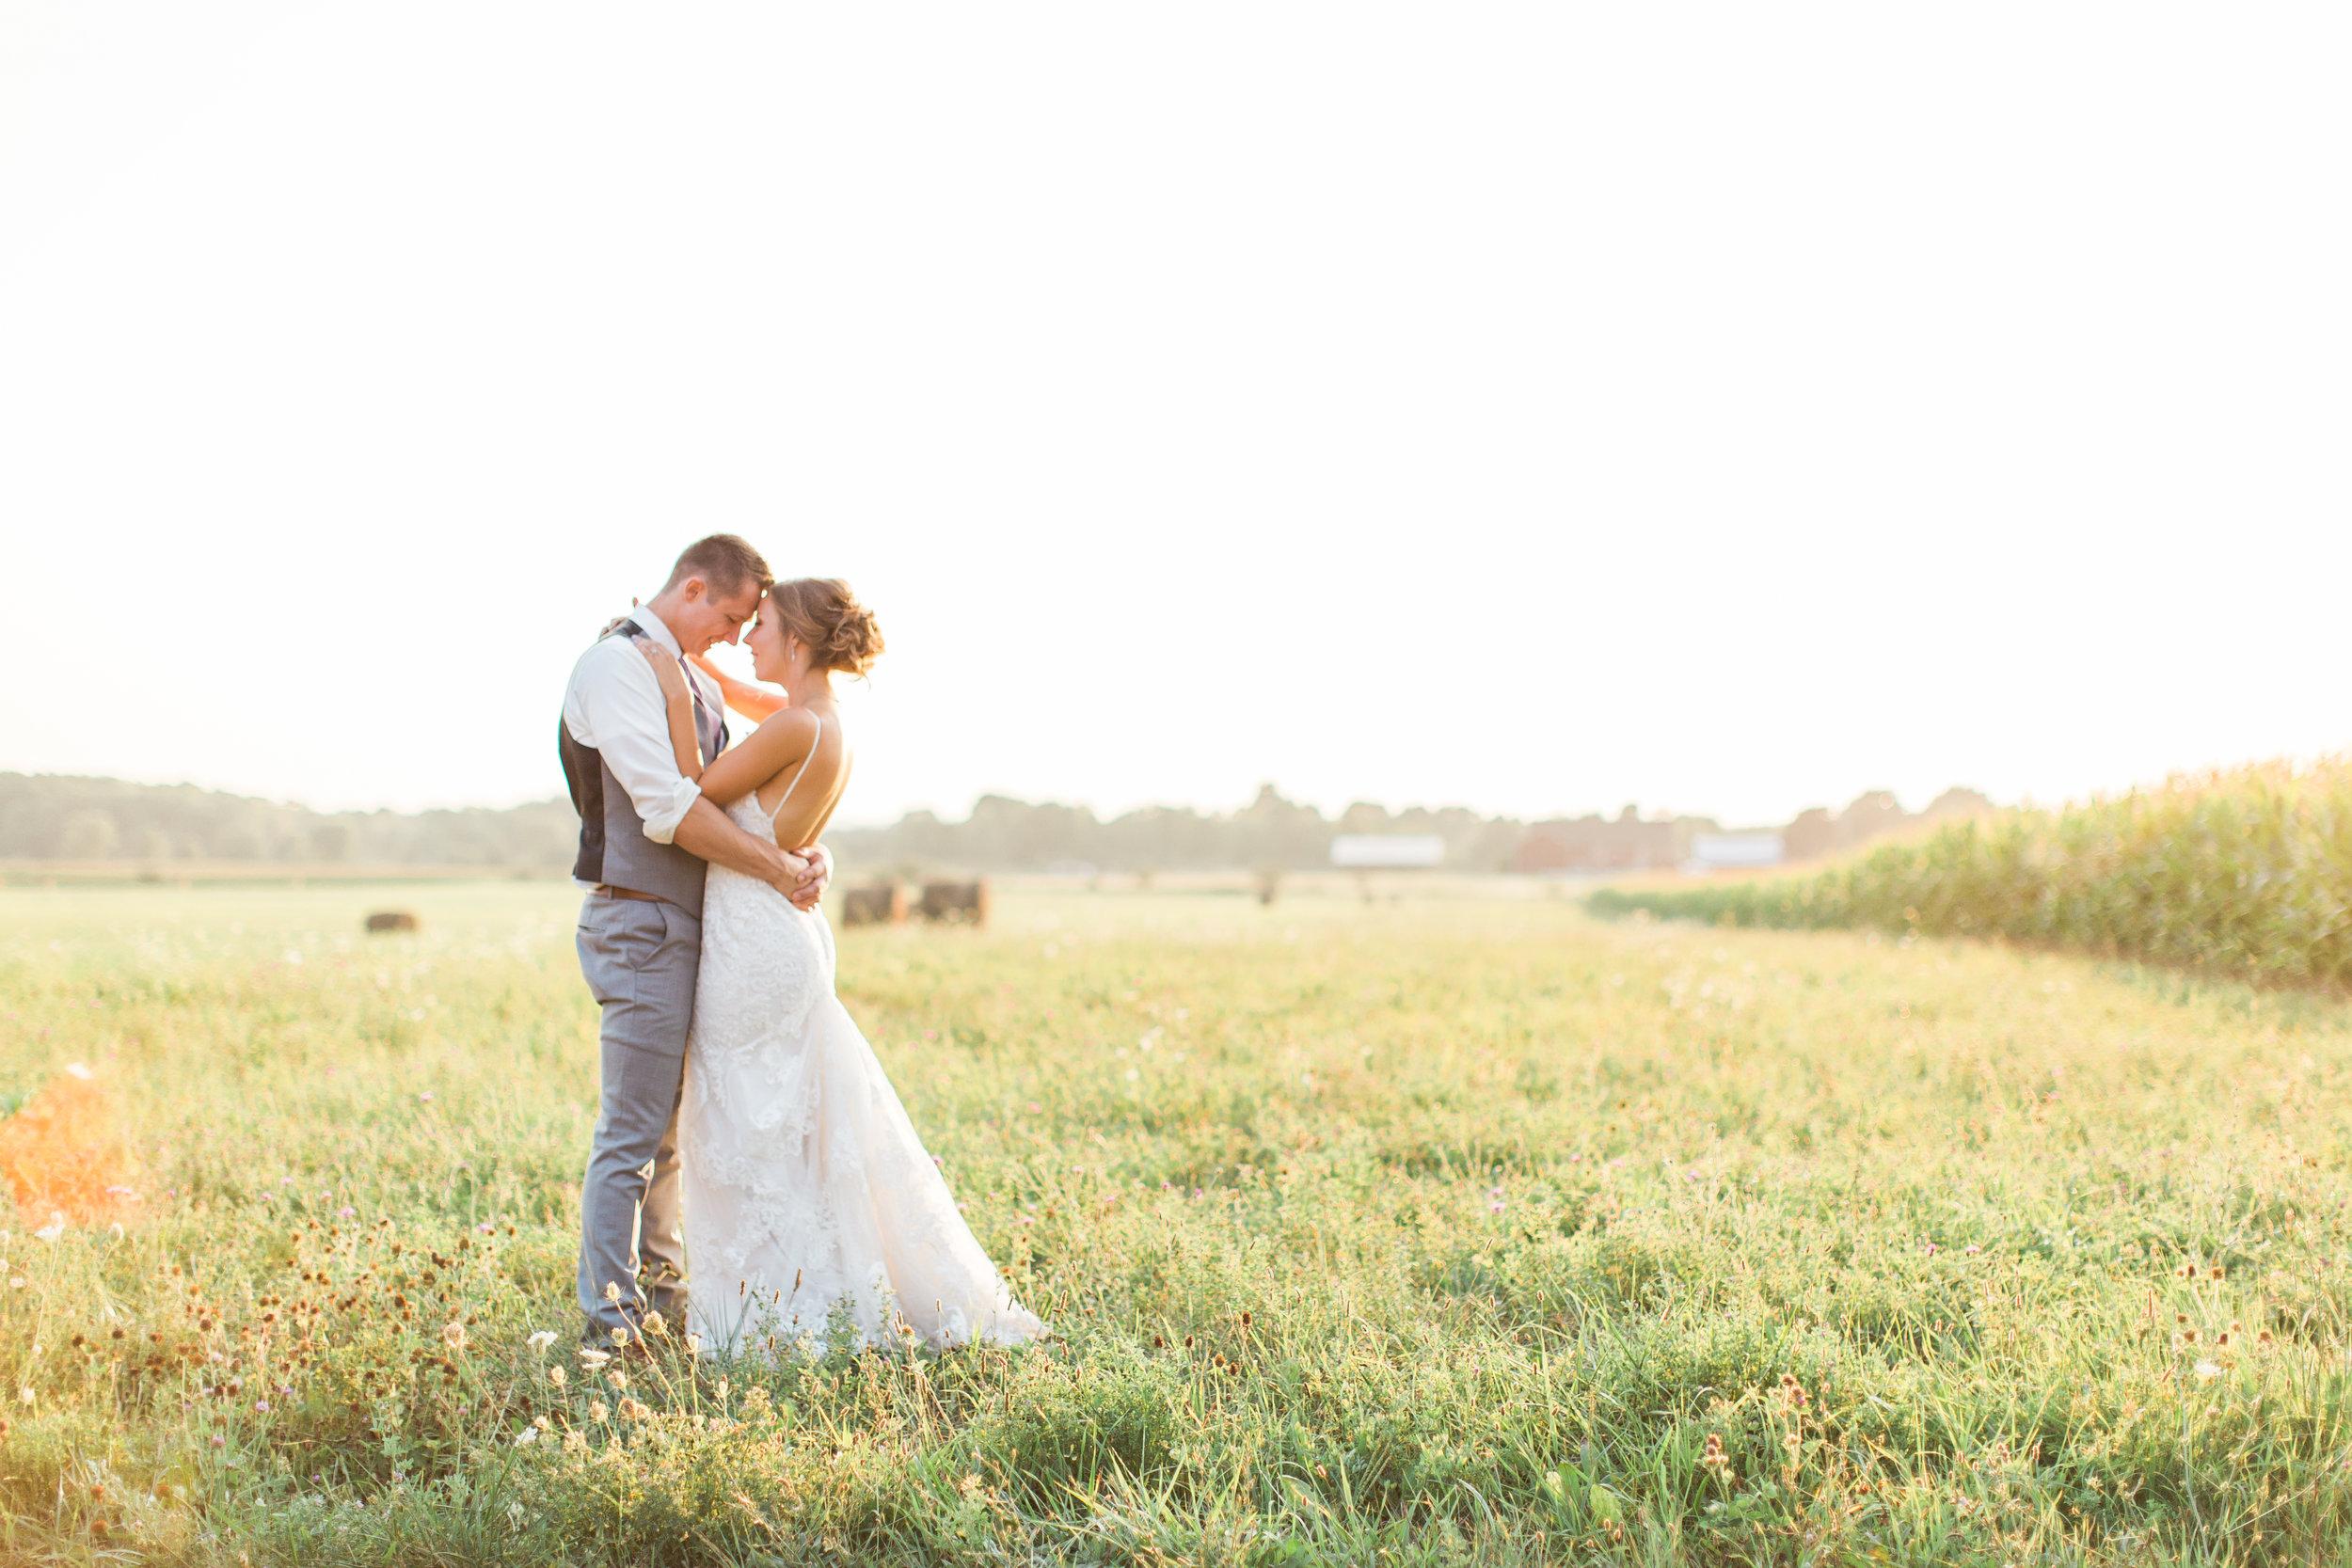 sunset portraits-warnsholz wedding-janelle elaine-29.jpg